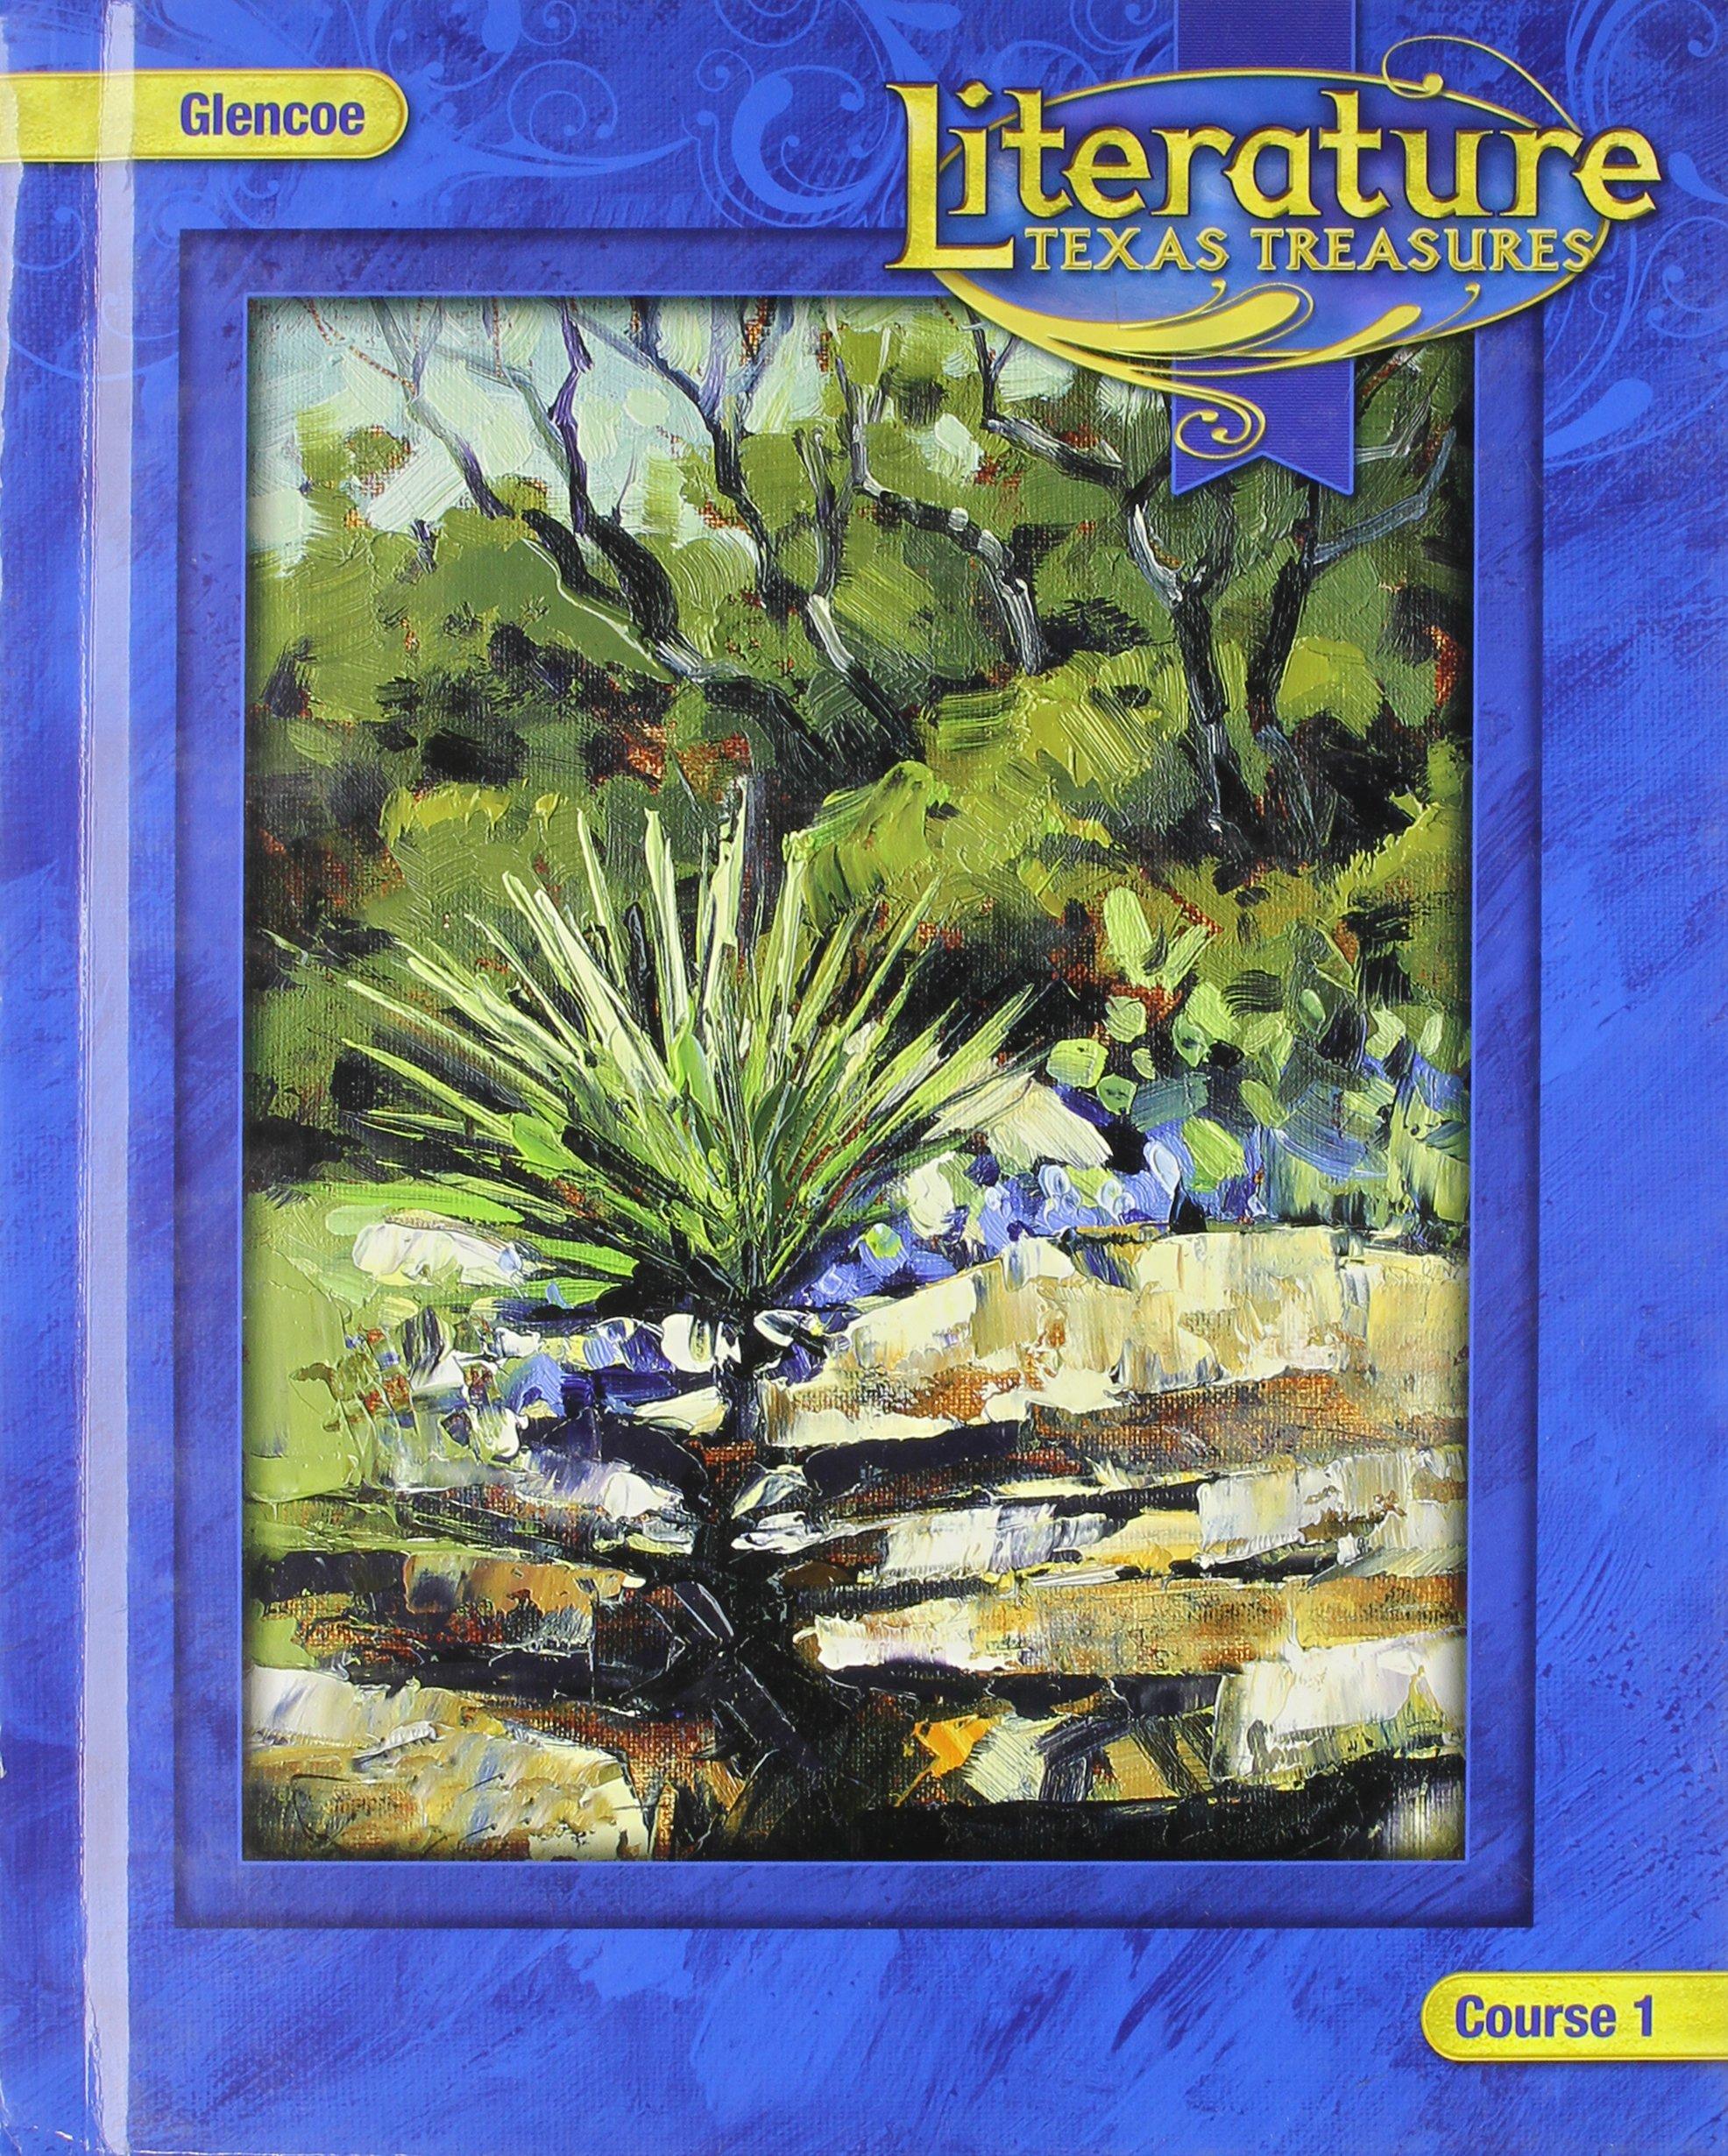 Literature: Texas Treasures, Course 1 (Glencoe Literature)